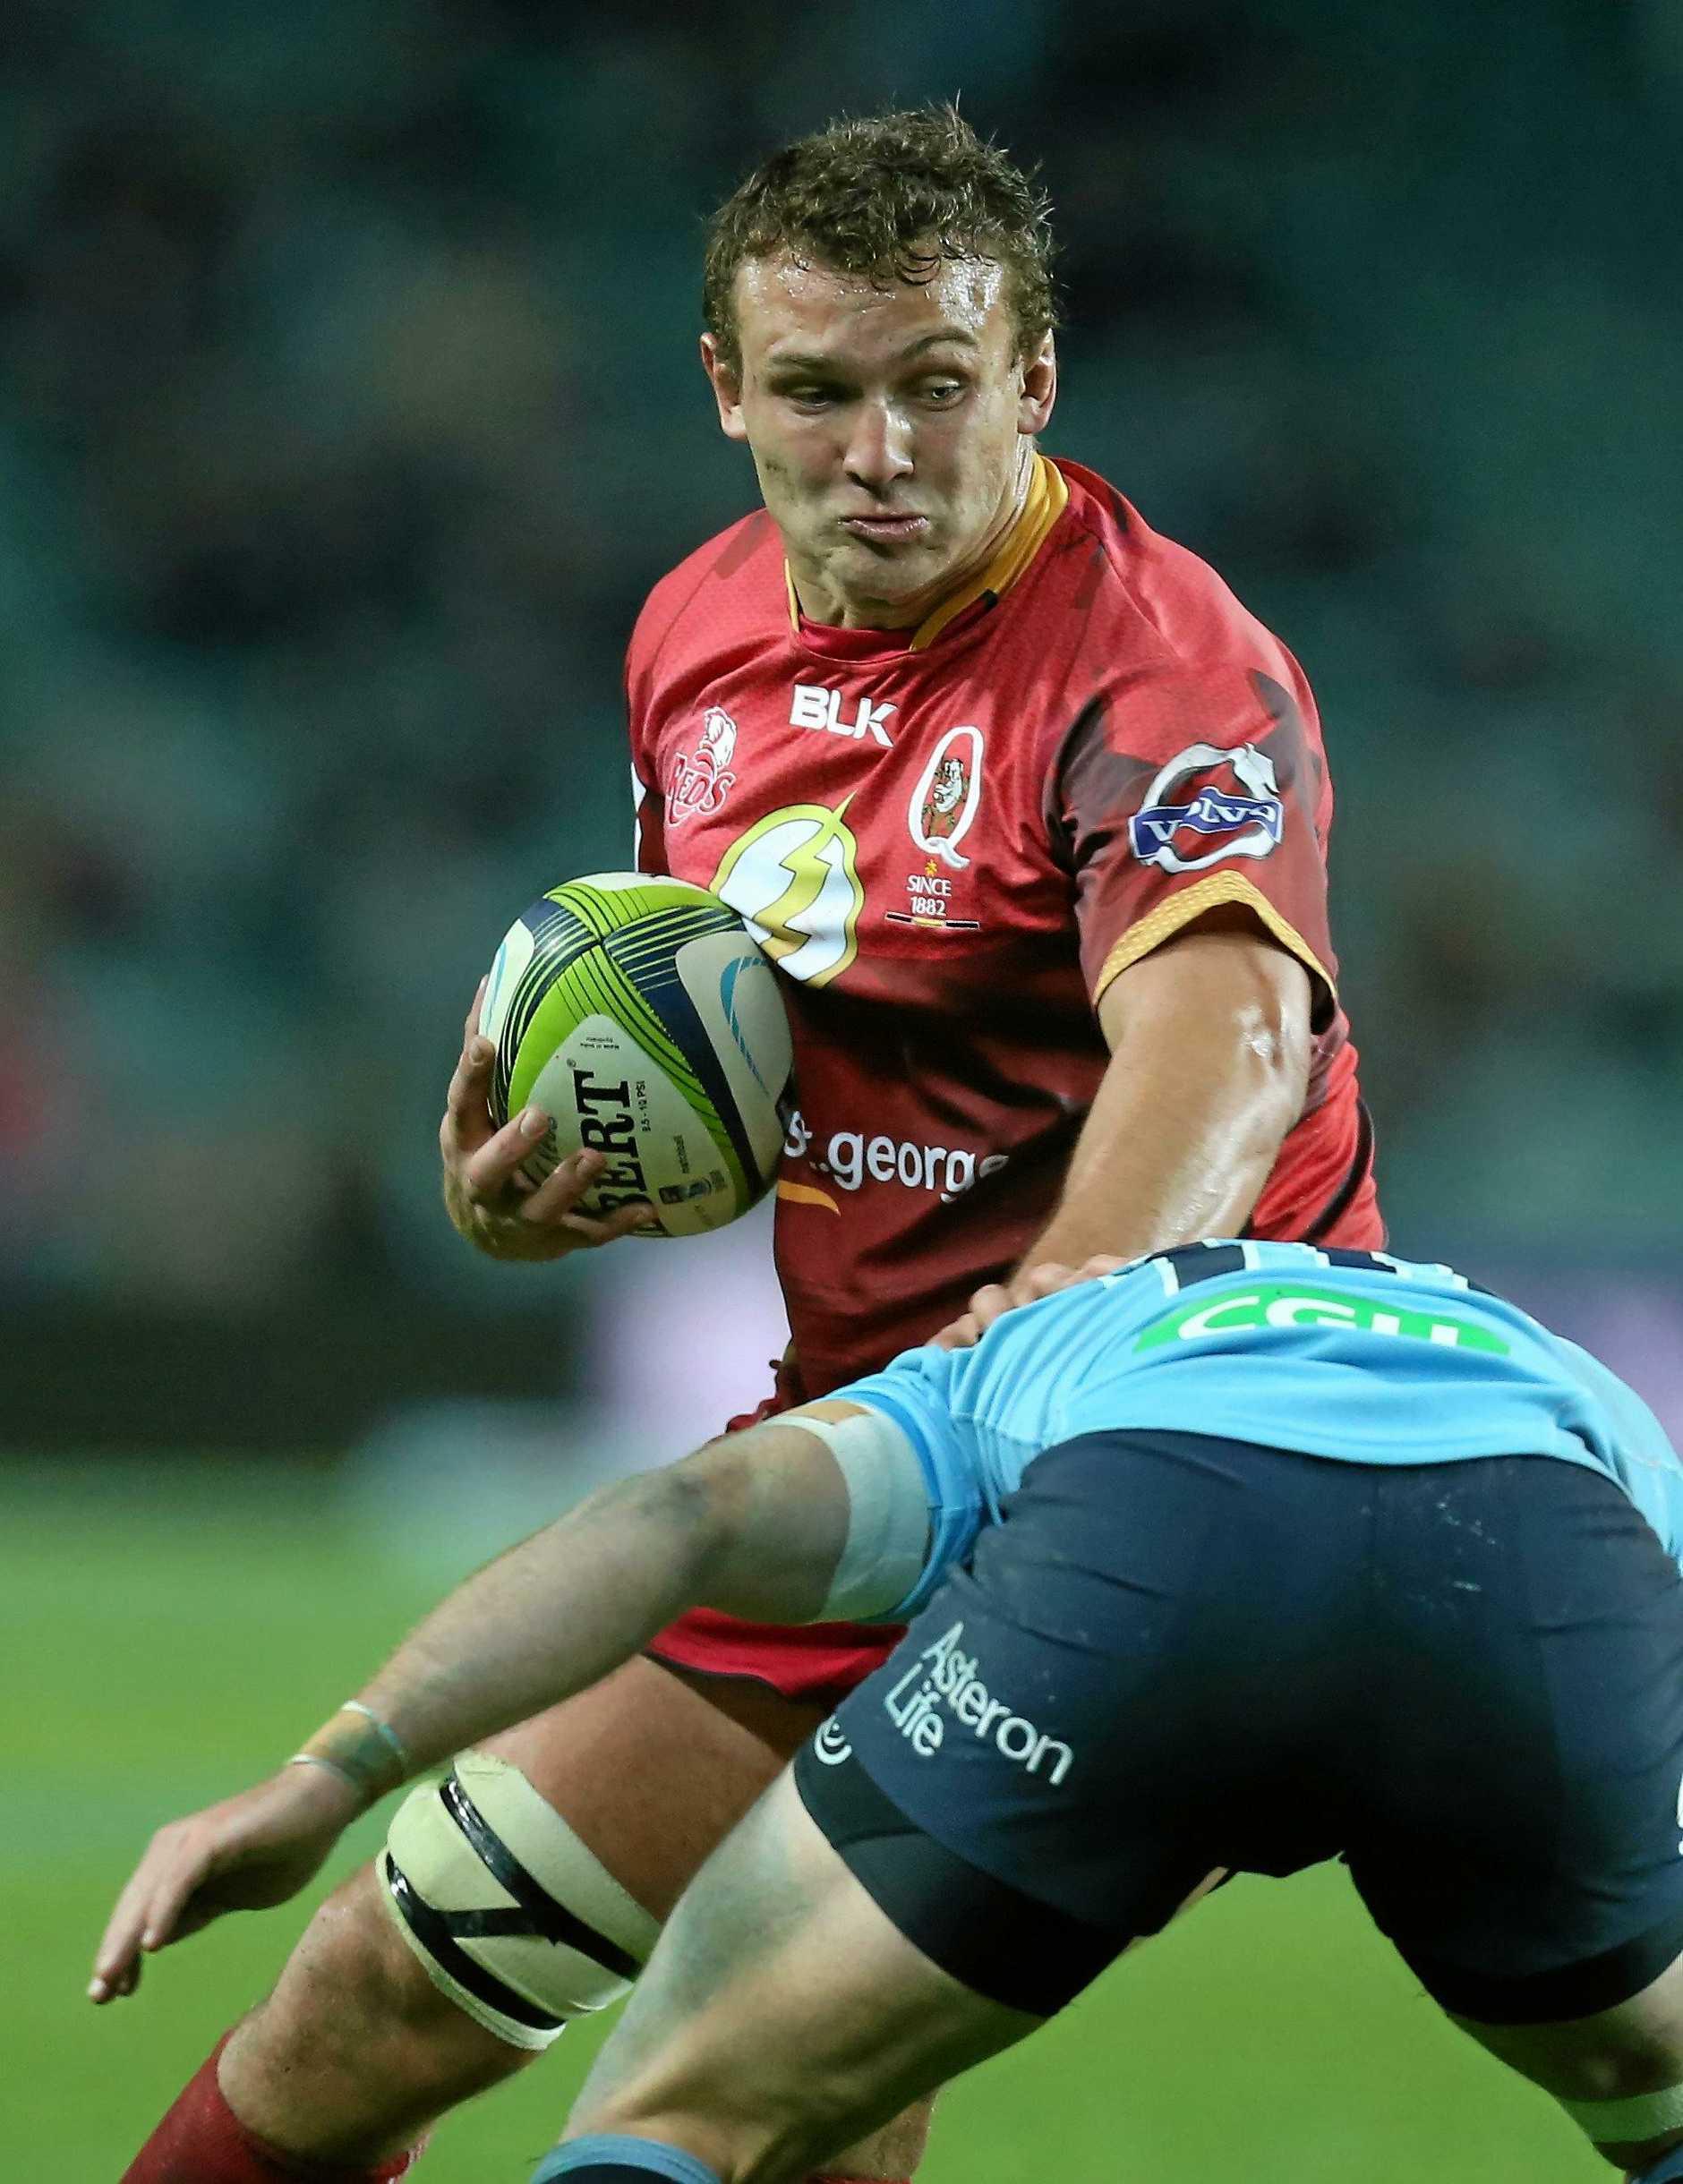 Jake Schatz in action for the Queensland Reds.